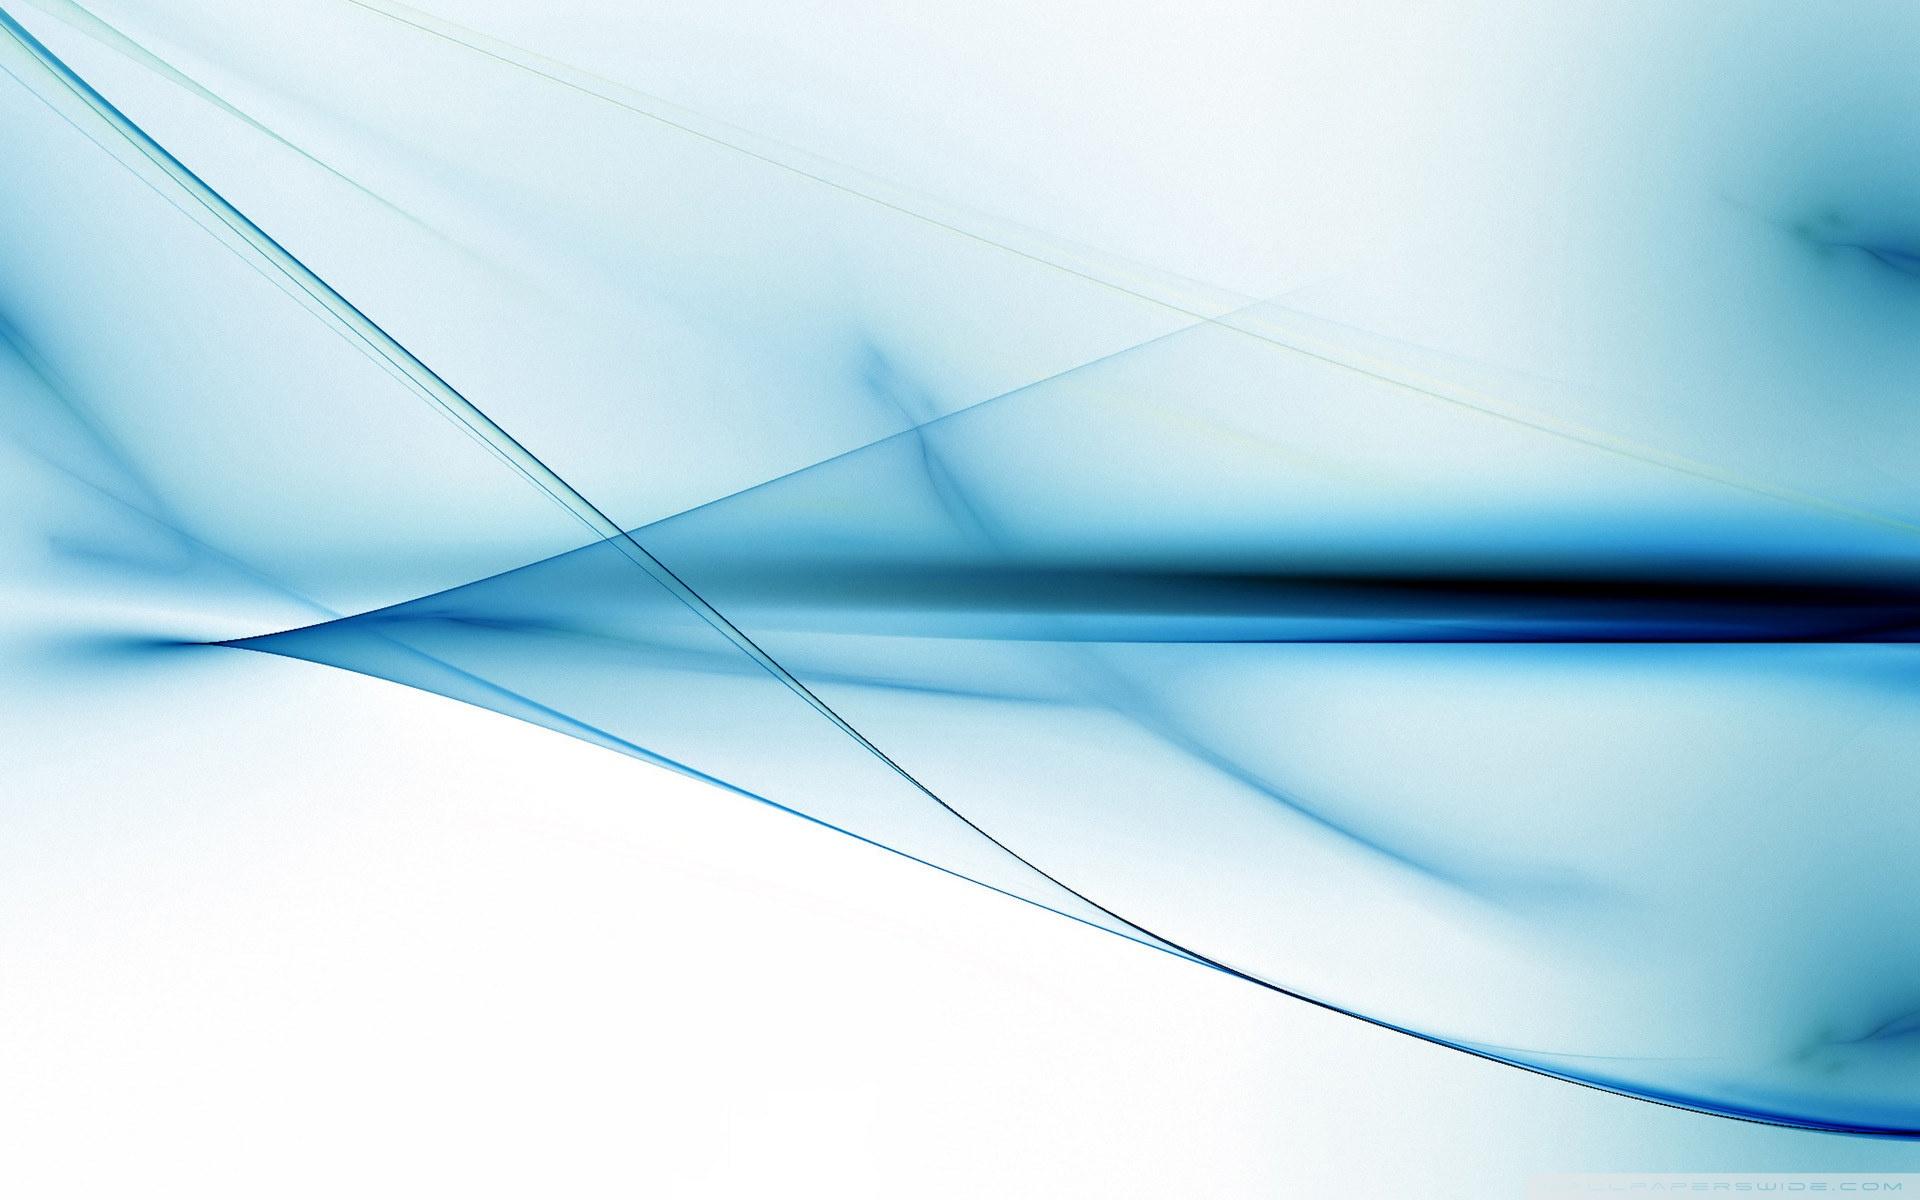 Blue And White HD desktop wallpaper High Definition Fullscreen 1920x1200